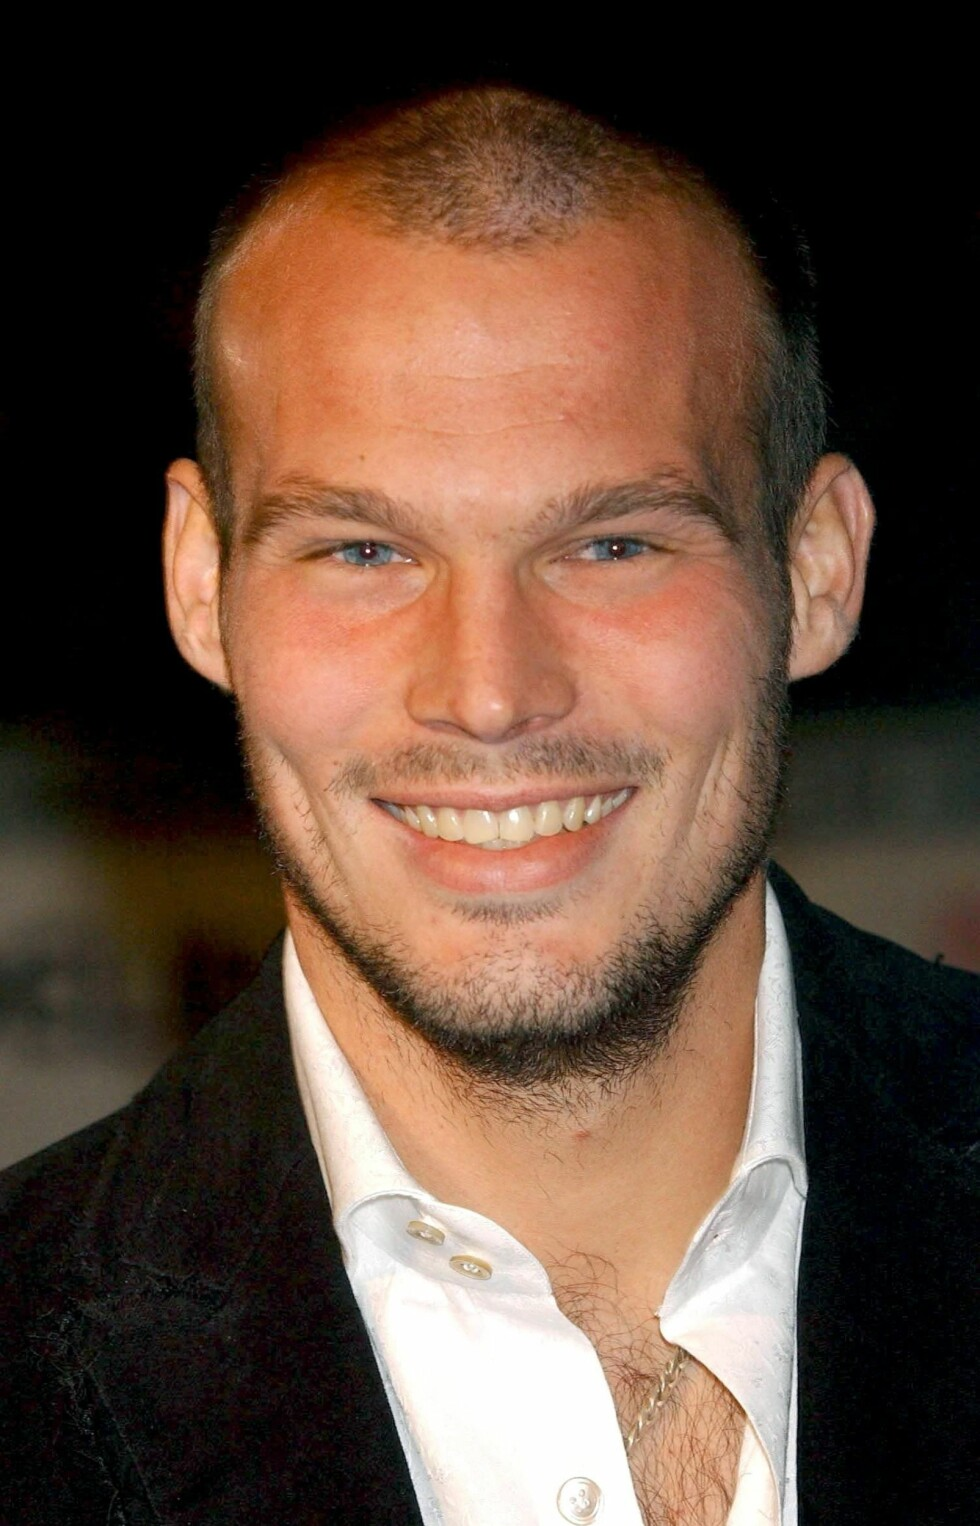 SVERIGE: Fredrik Ljungberg